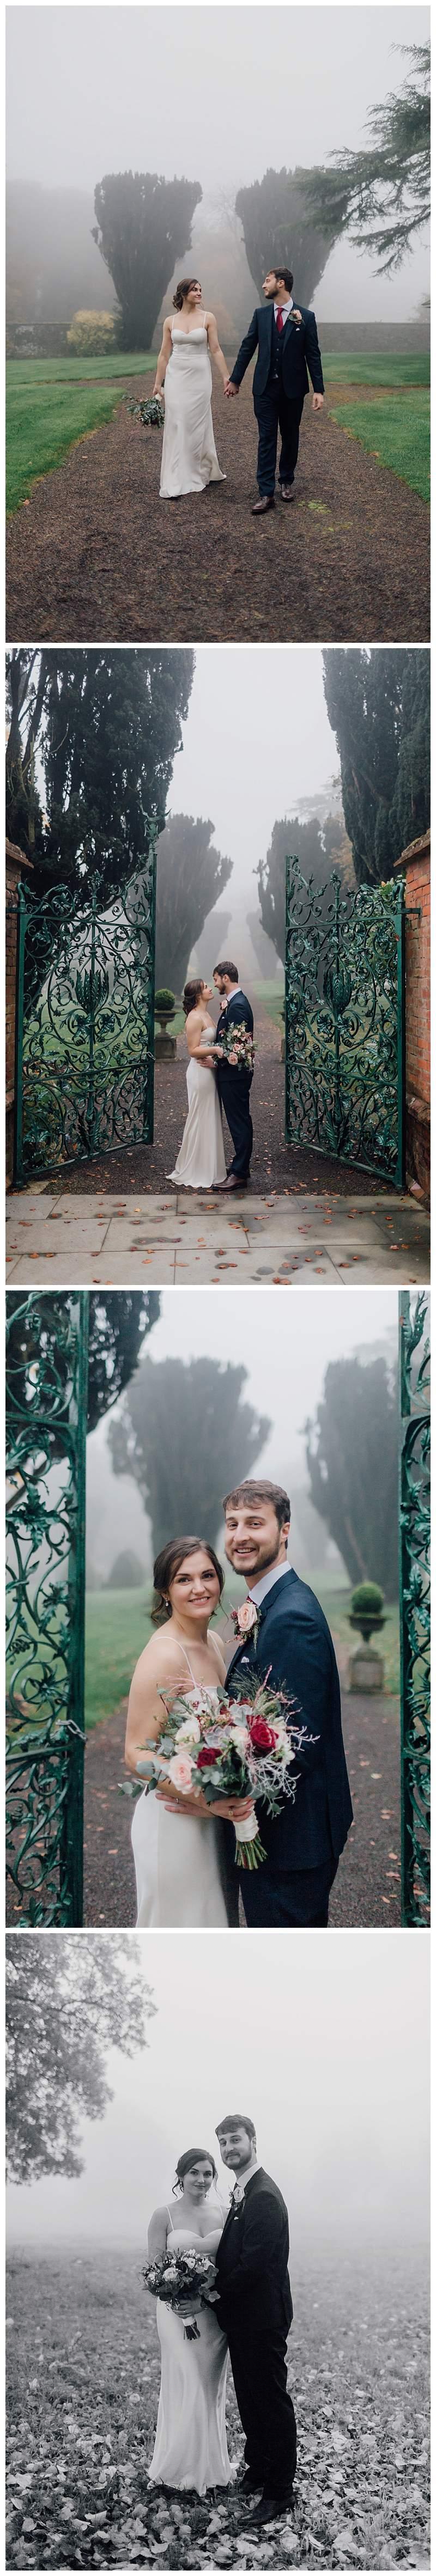 meath wedding photographer fine art kilkenny